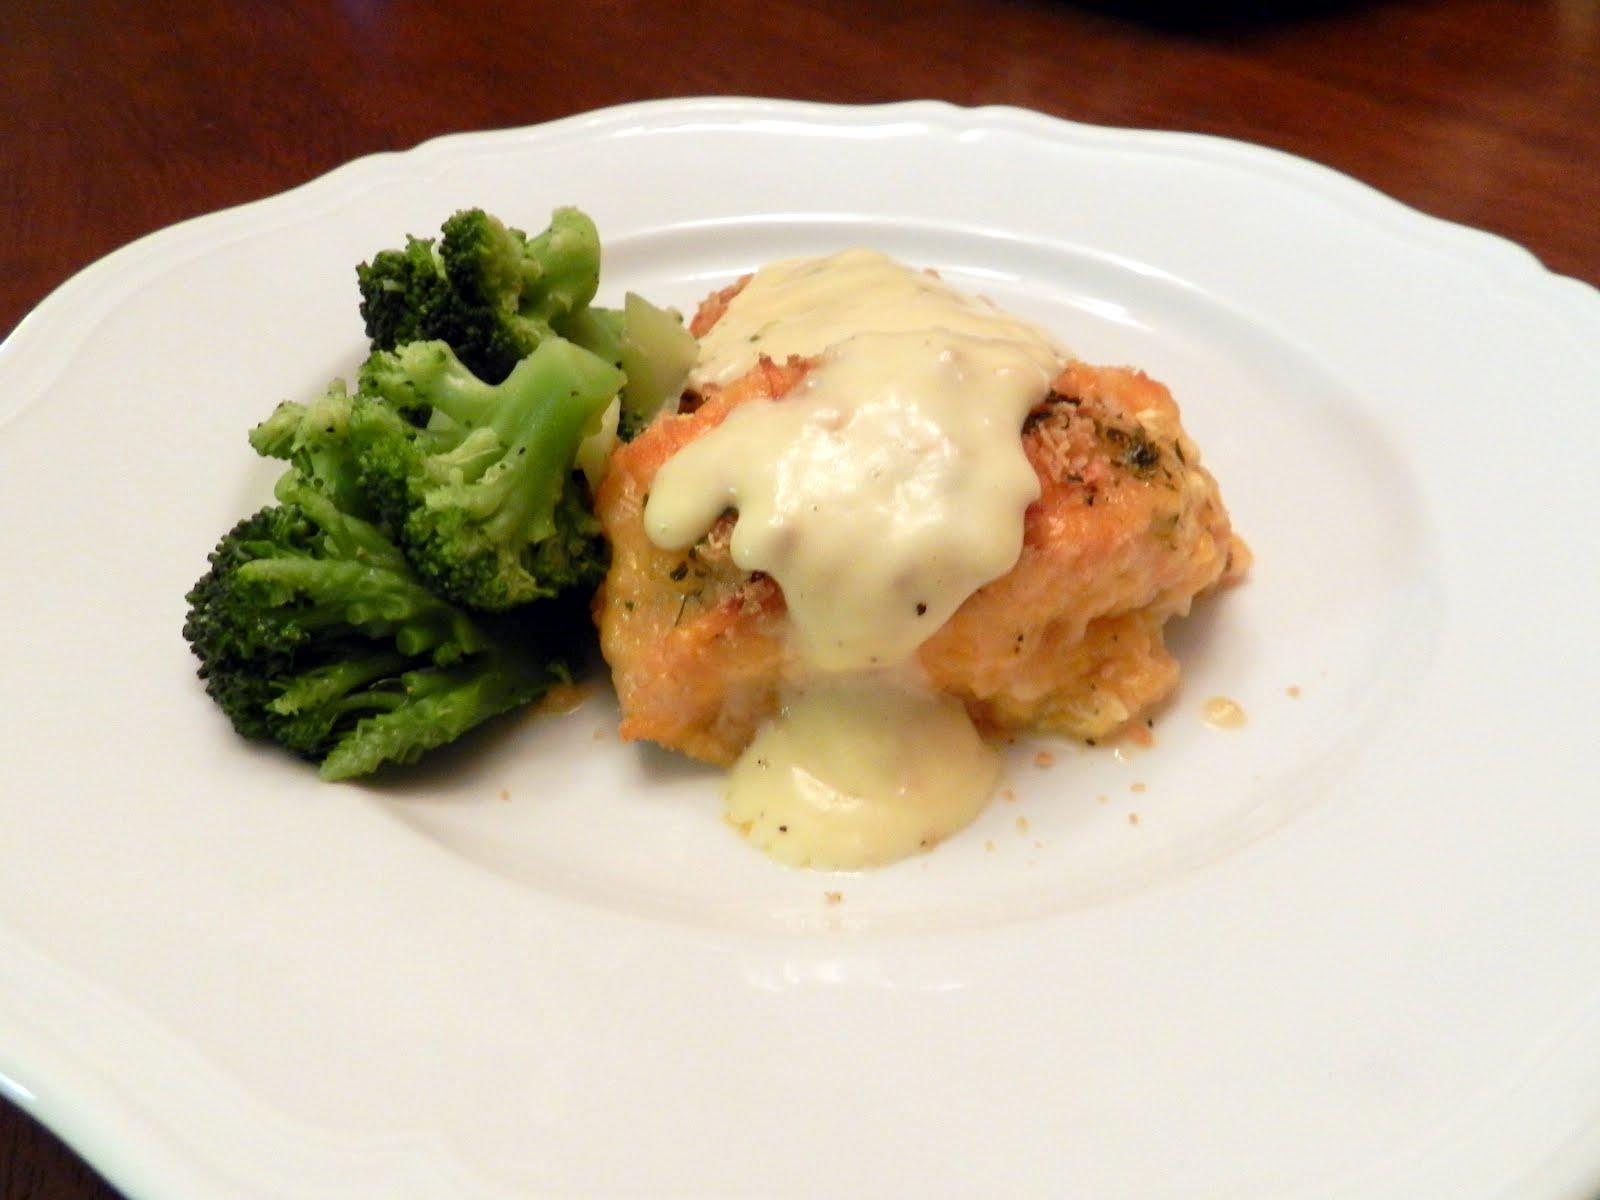 The Hutchins Family Recipes: Crispy Cheddar Chicken